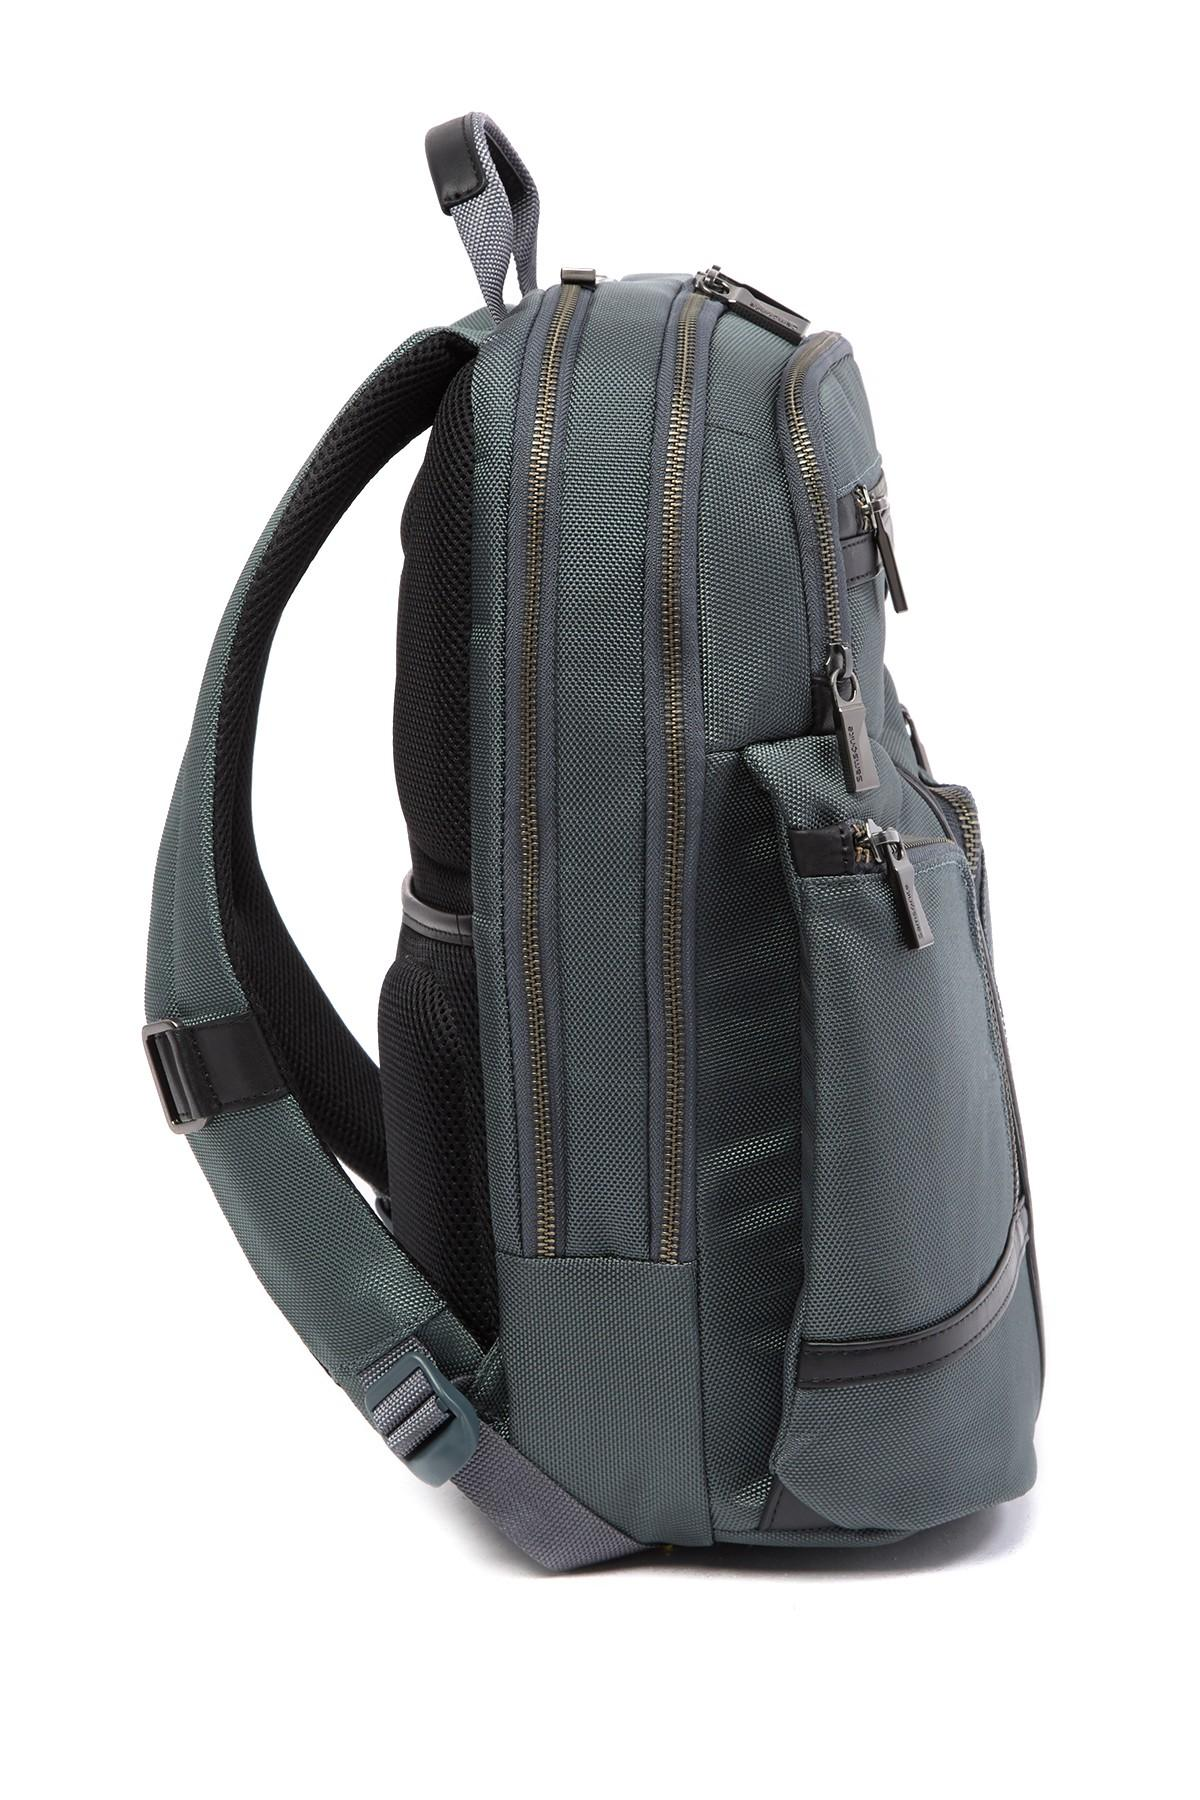 e04b79395a9 Samsonite Gt Supreme Laptop Backpack 14.1 | The Shred Centre